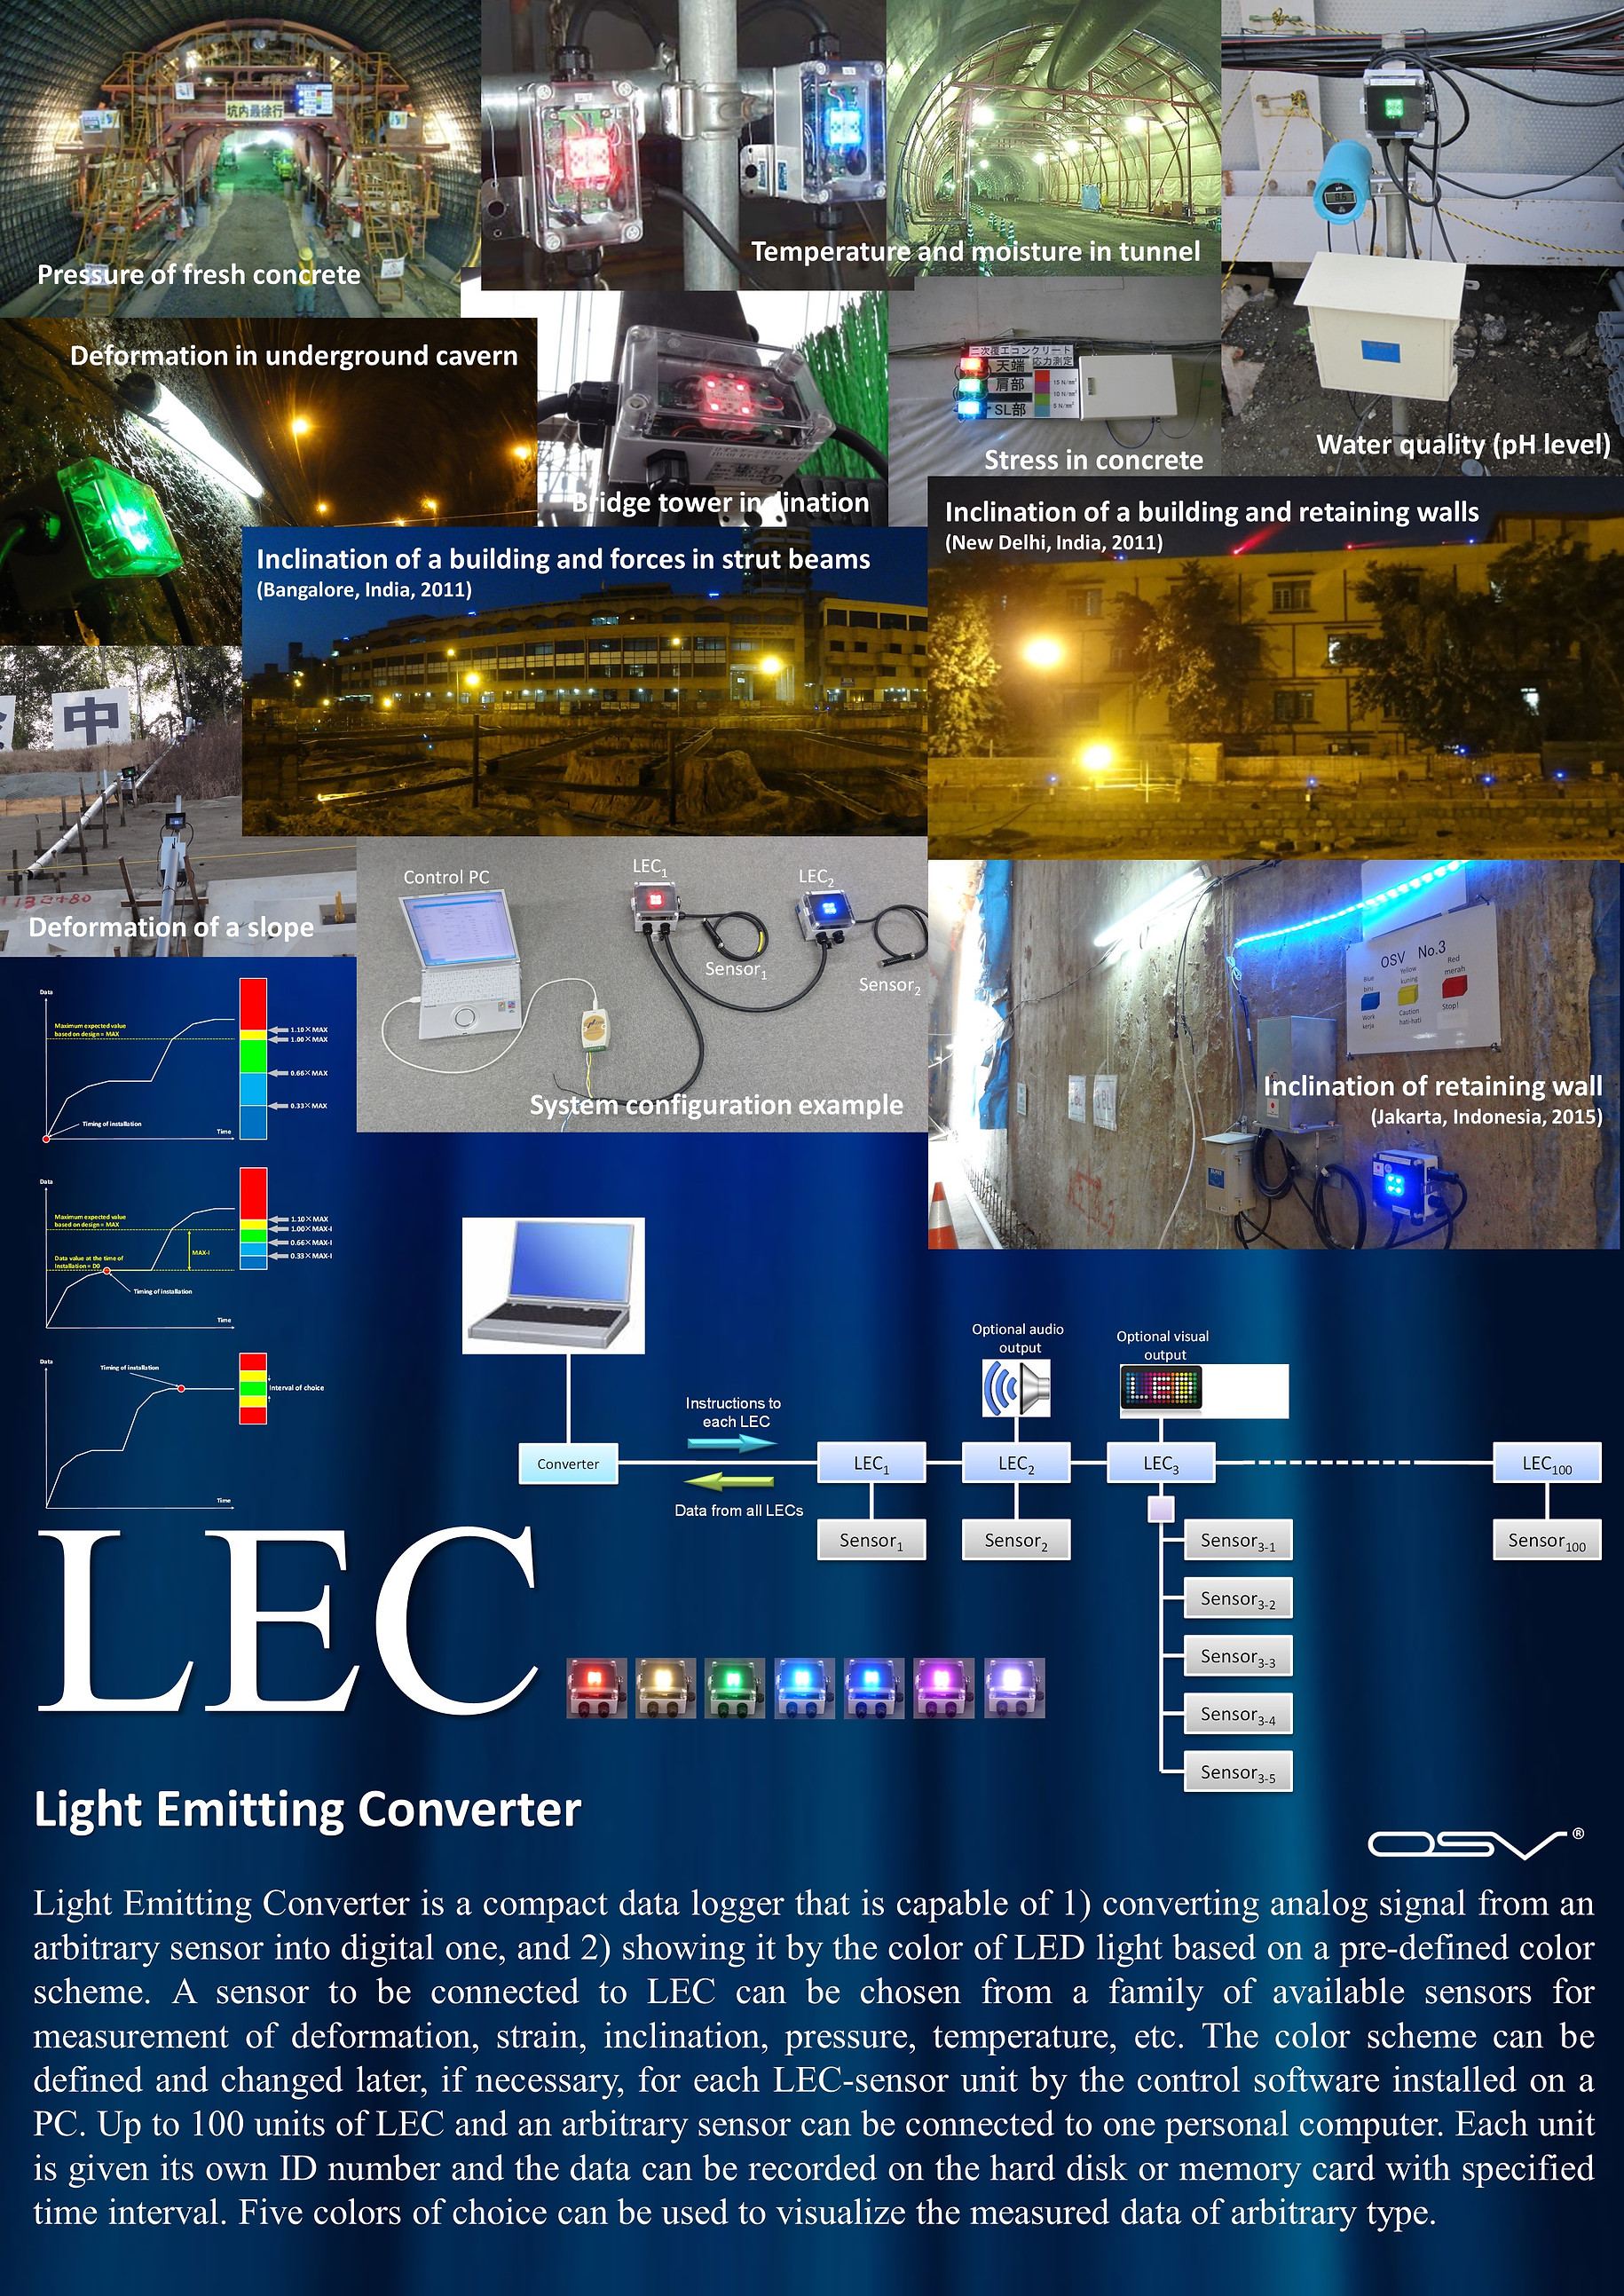 LECスライド1.JPG